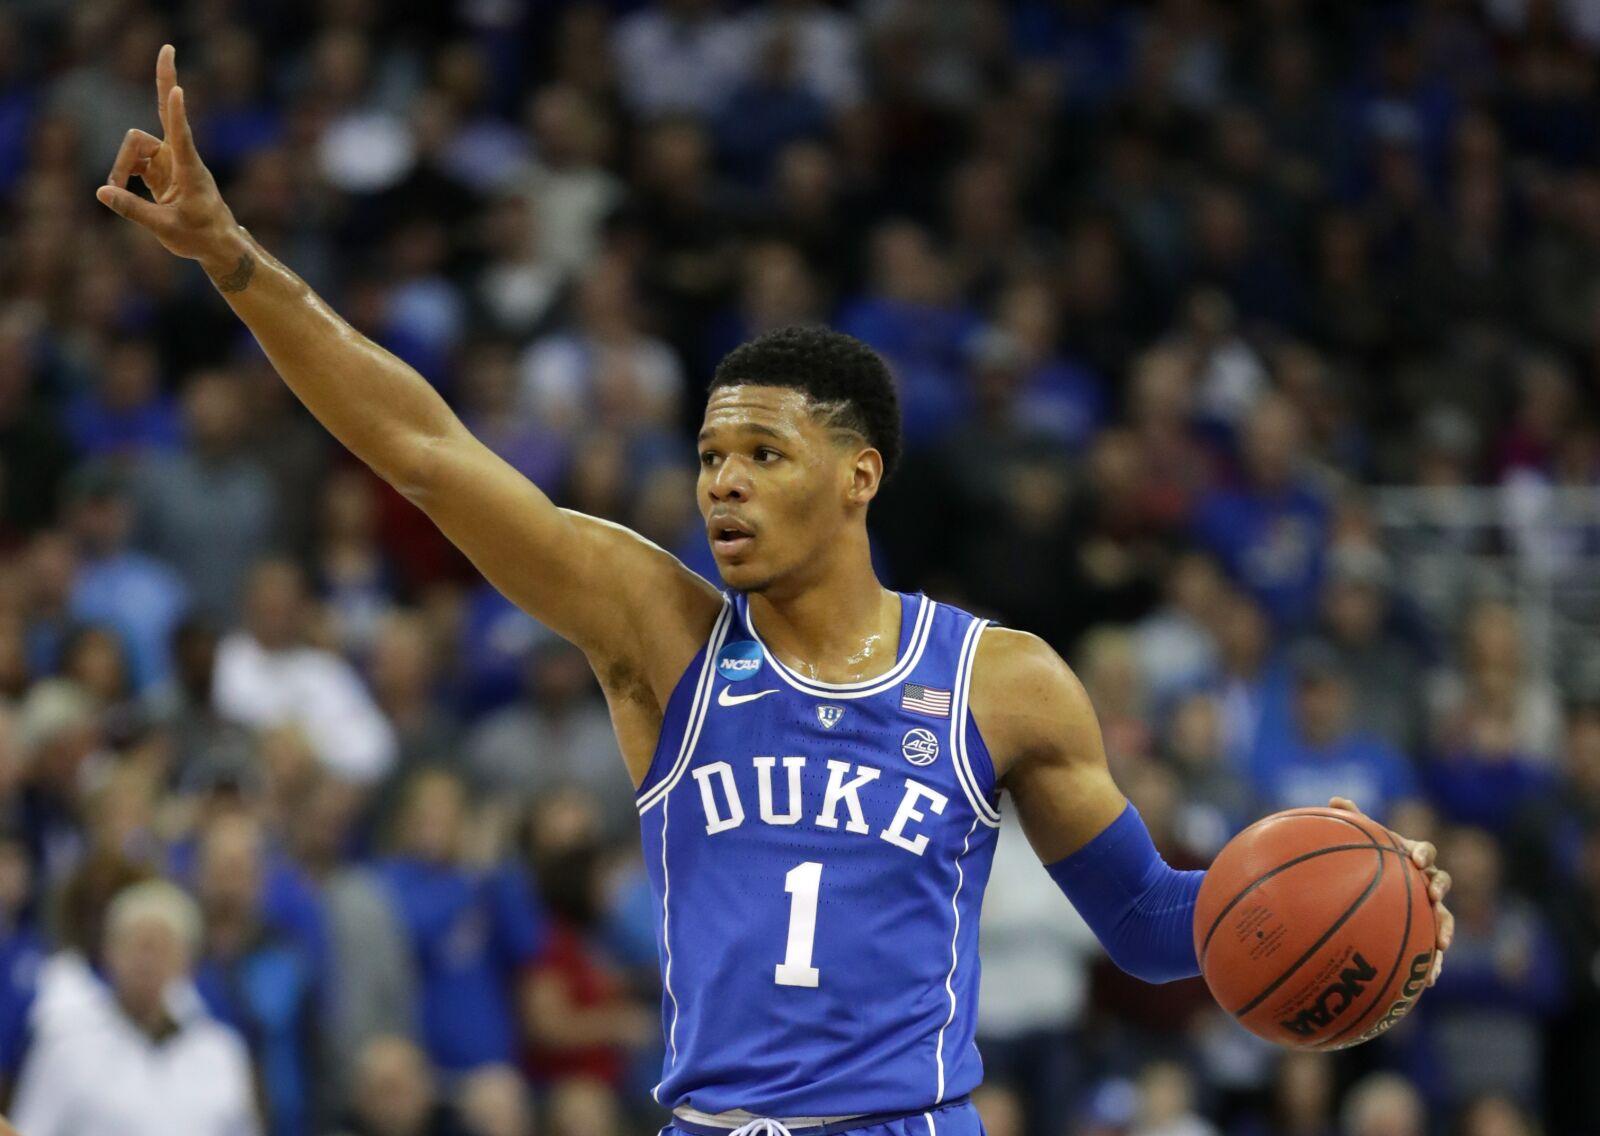 Duke Basketball: Trevon Duval Goes Undrafted in NBA Draft